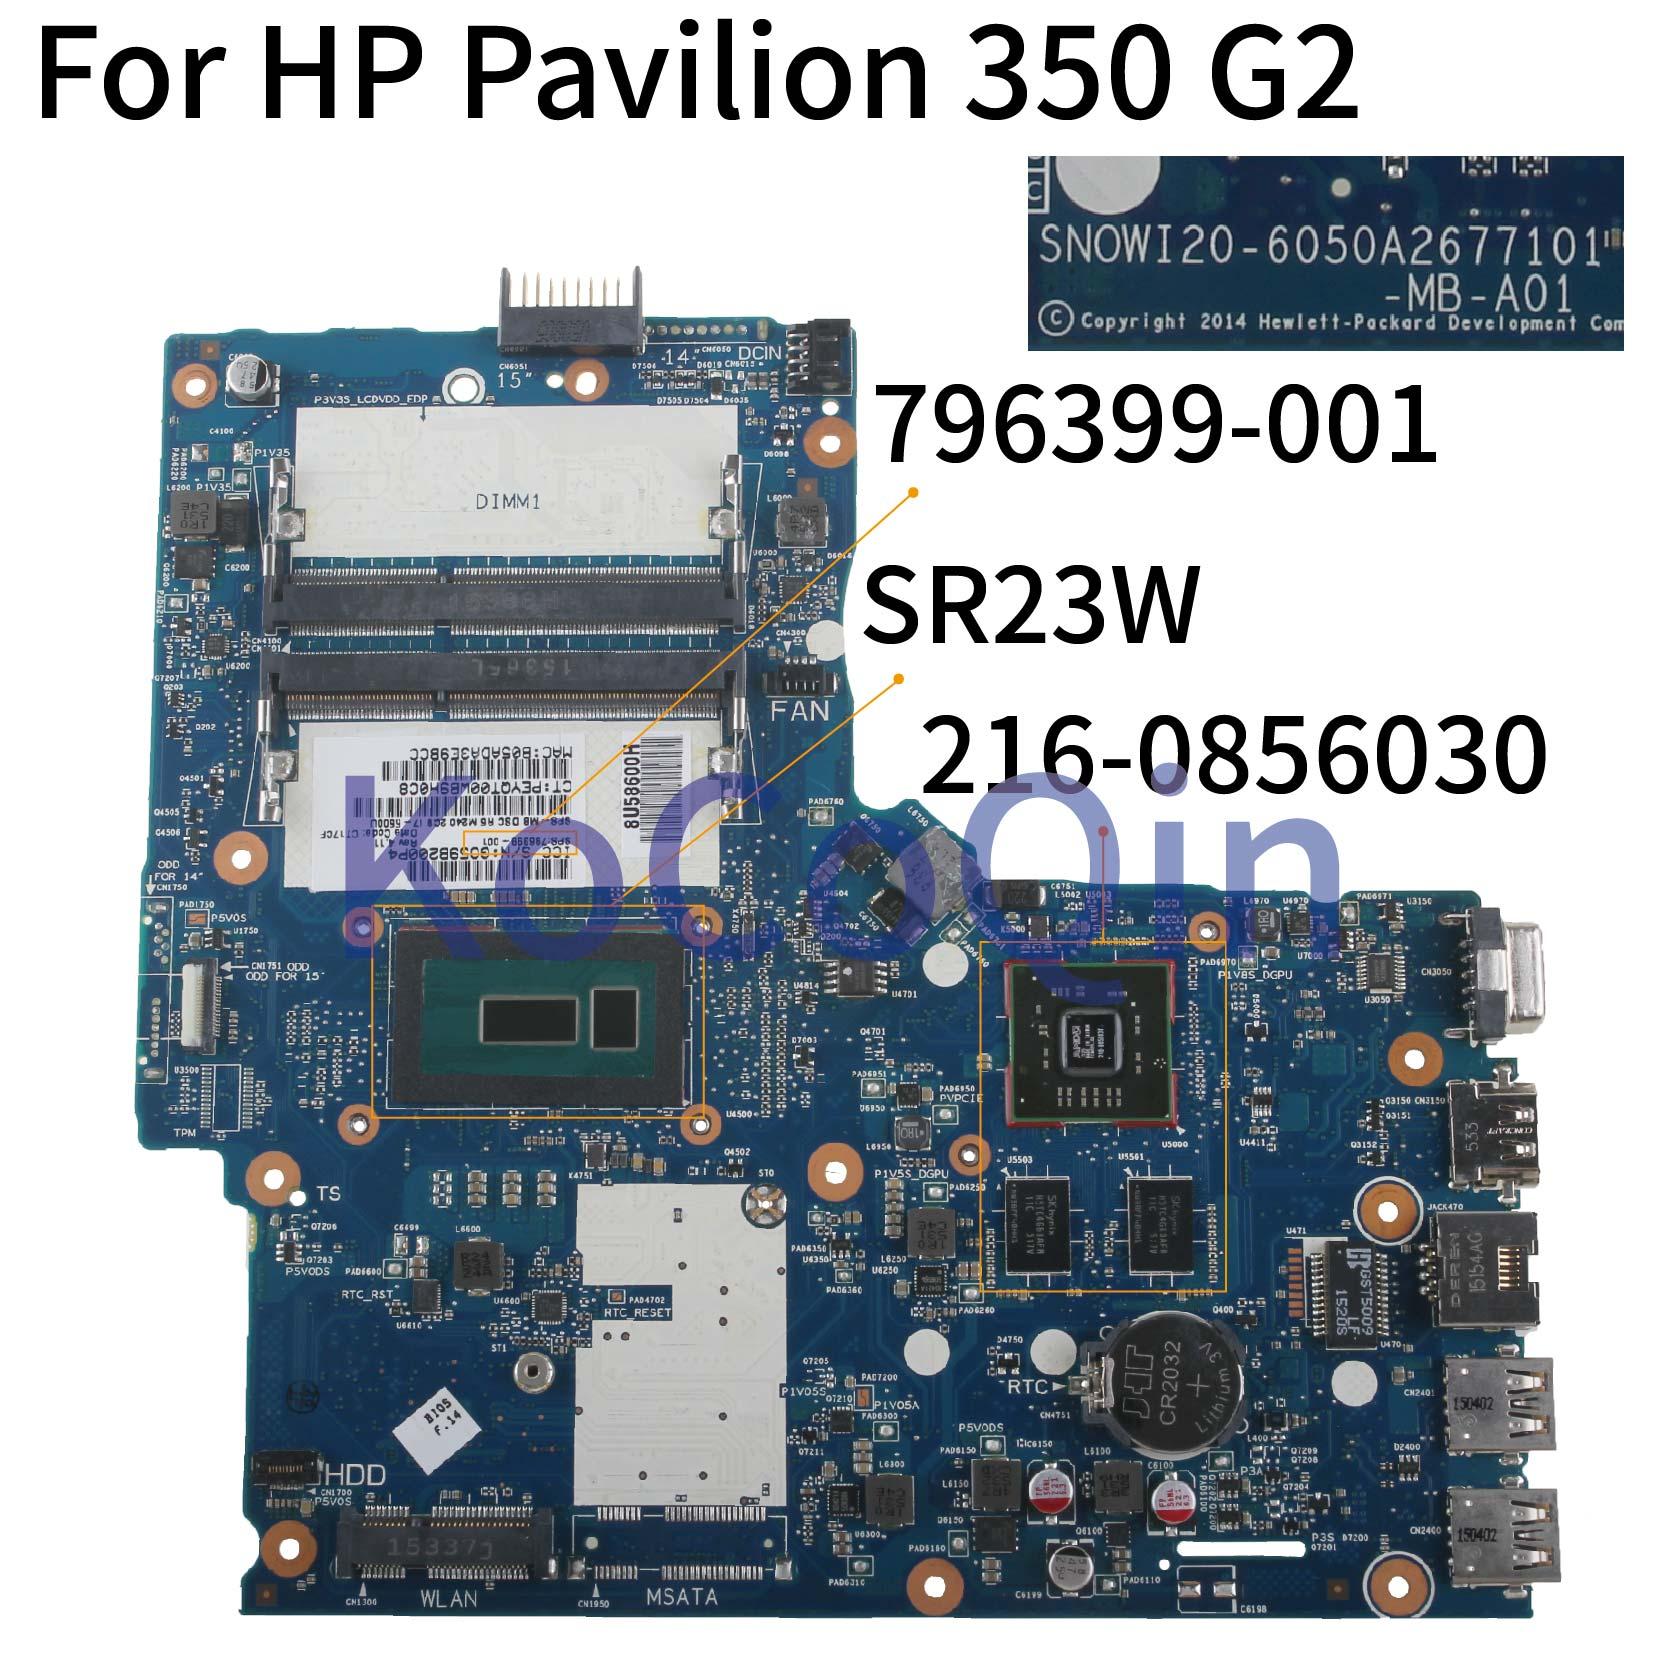 Motherboard para o hp Kocoqin Laptop Pavilion I7-5500u Mainboard 796399-796399-501 6050a2677101-mb-a01 001 Sr23w 216-0856030 350 g2